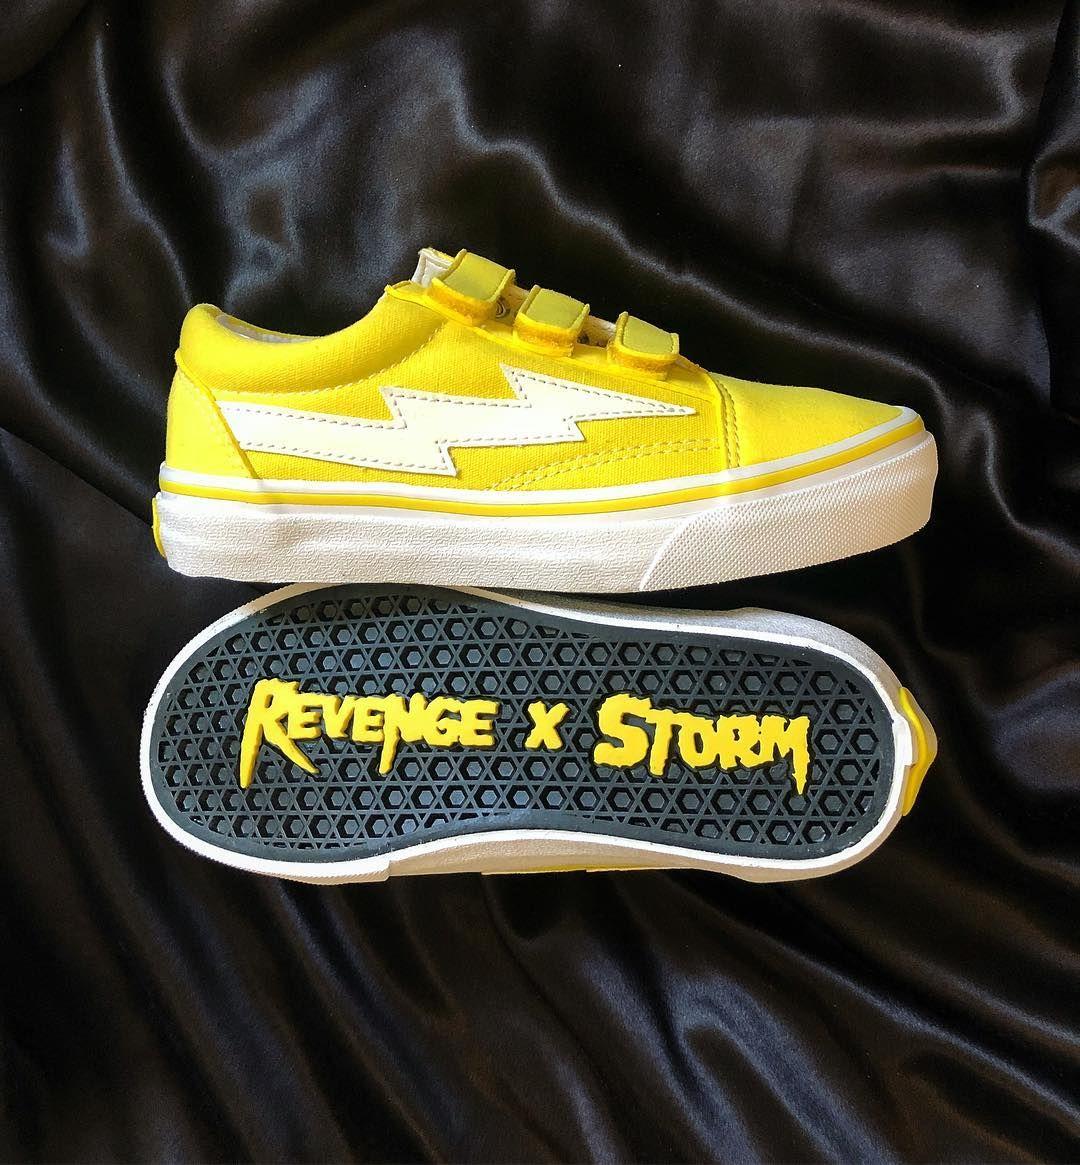 REVENGE STORM VELCRO STRAP | Hype shoes